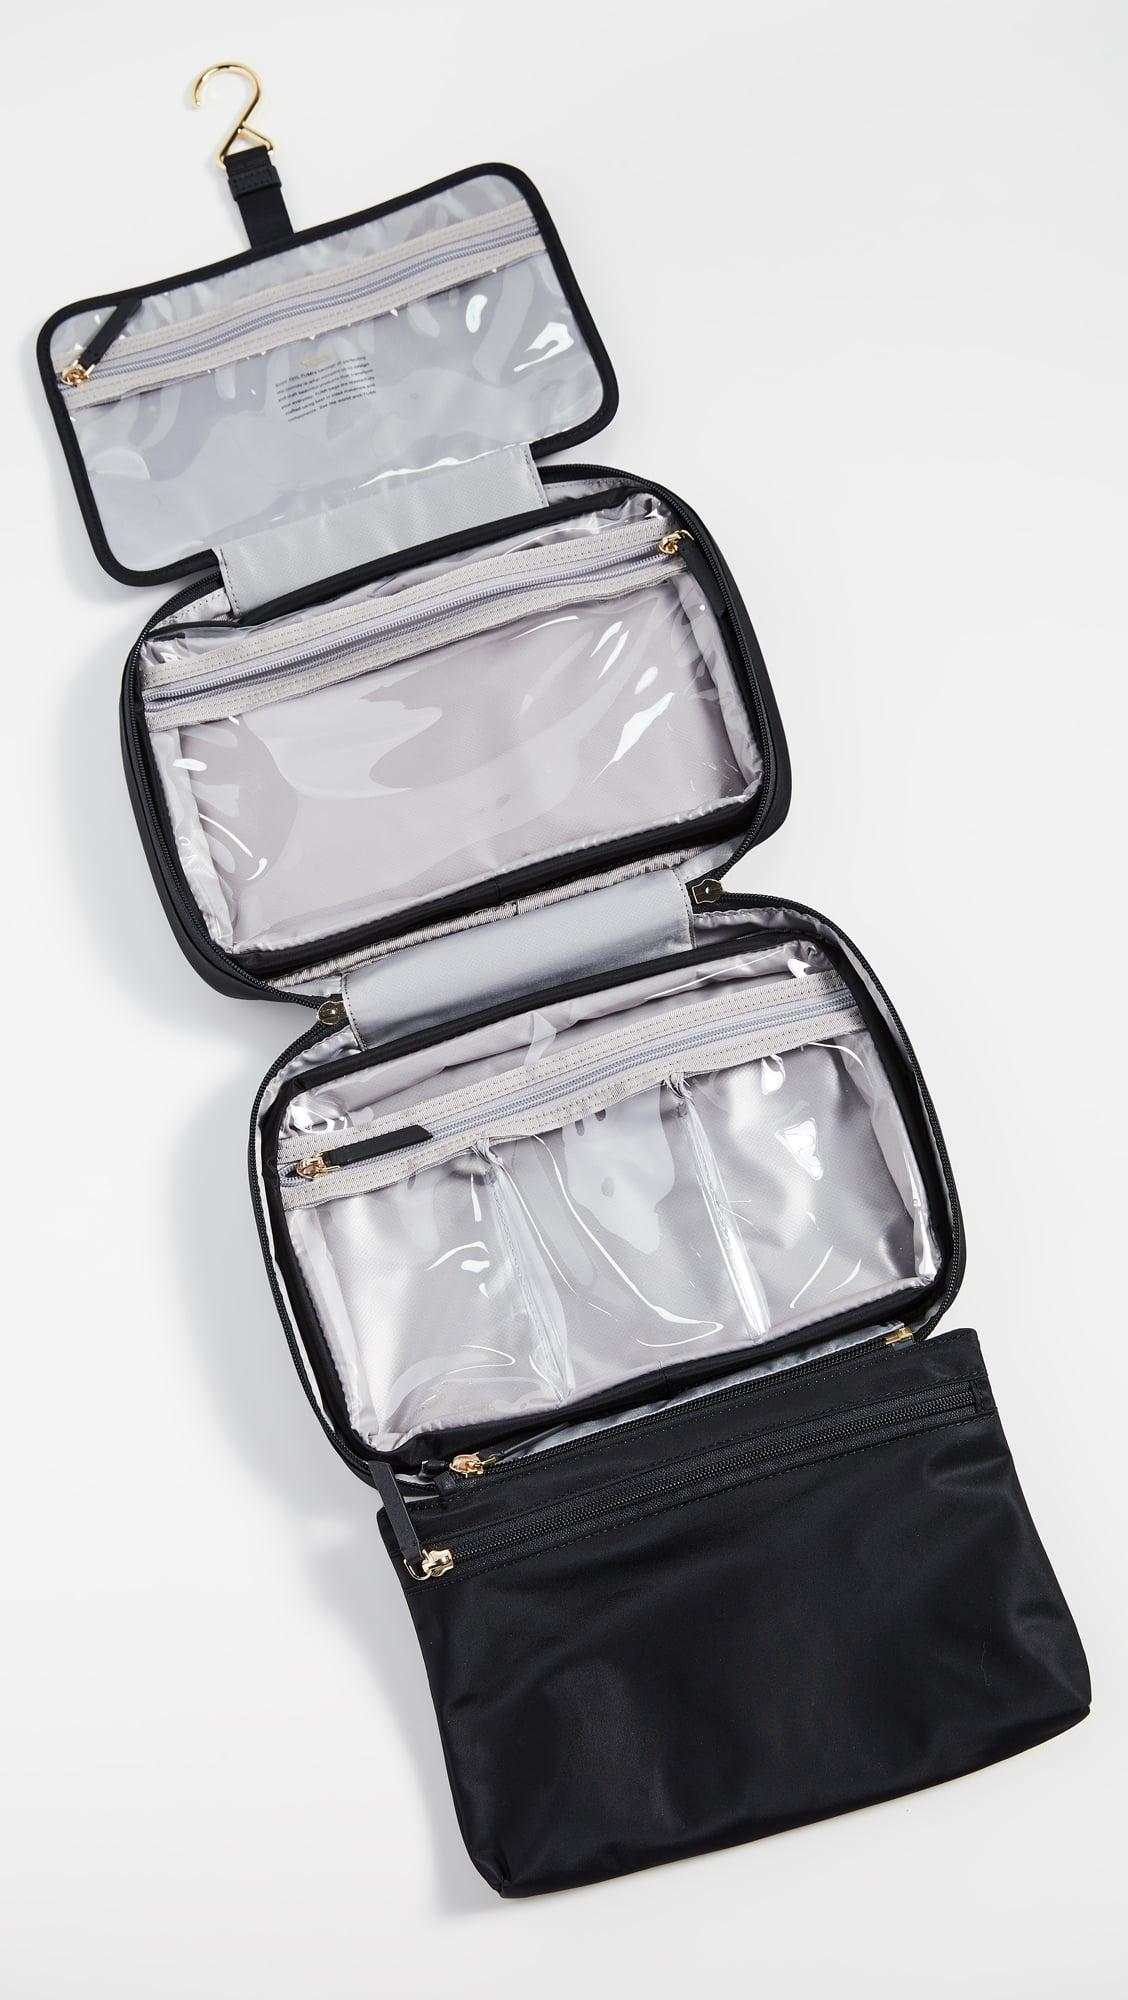 Gloria Kaos Vanity Case Mallette Beauty Case ultra l/ég/ère en polycarbonate flexible